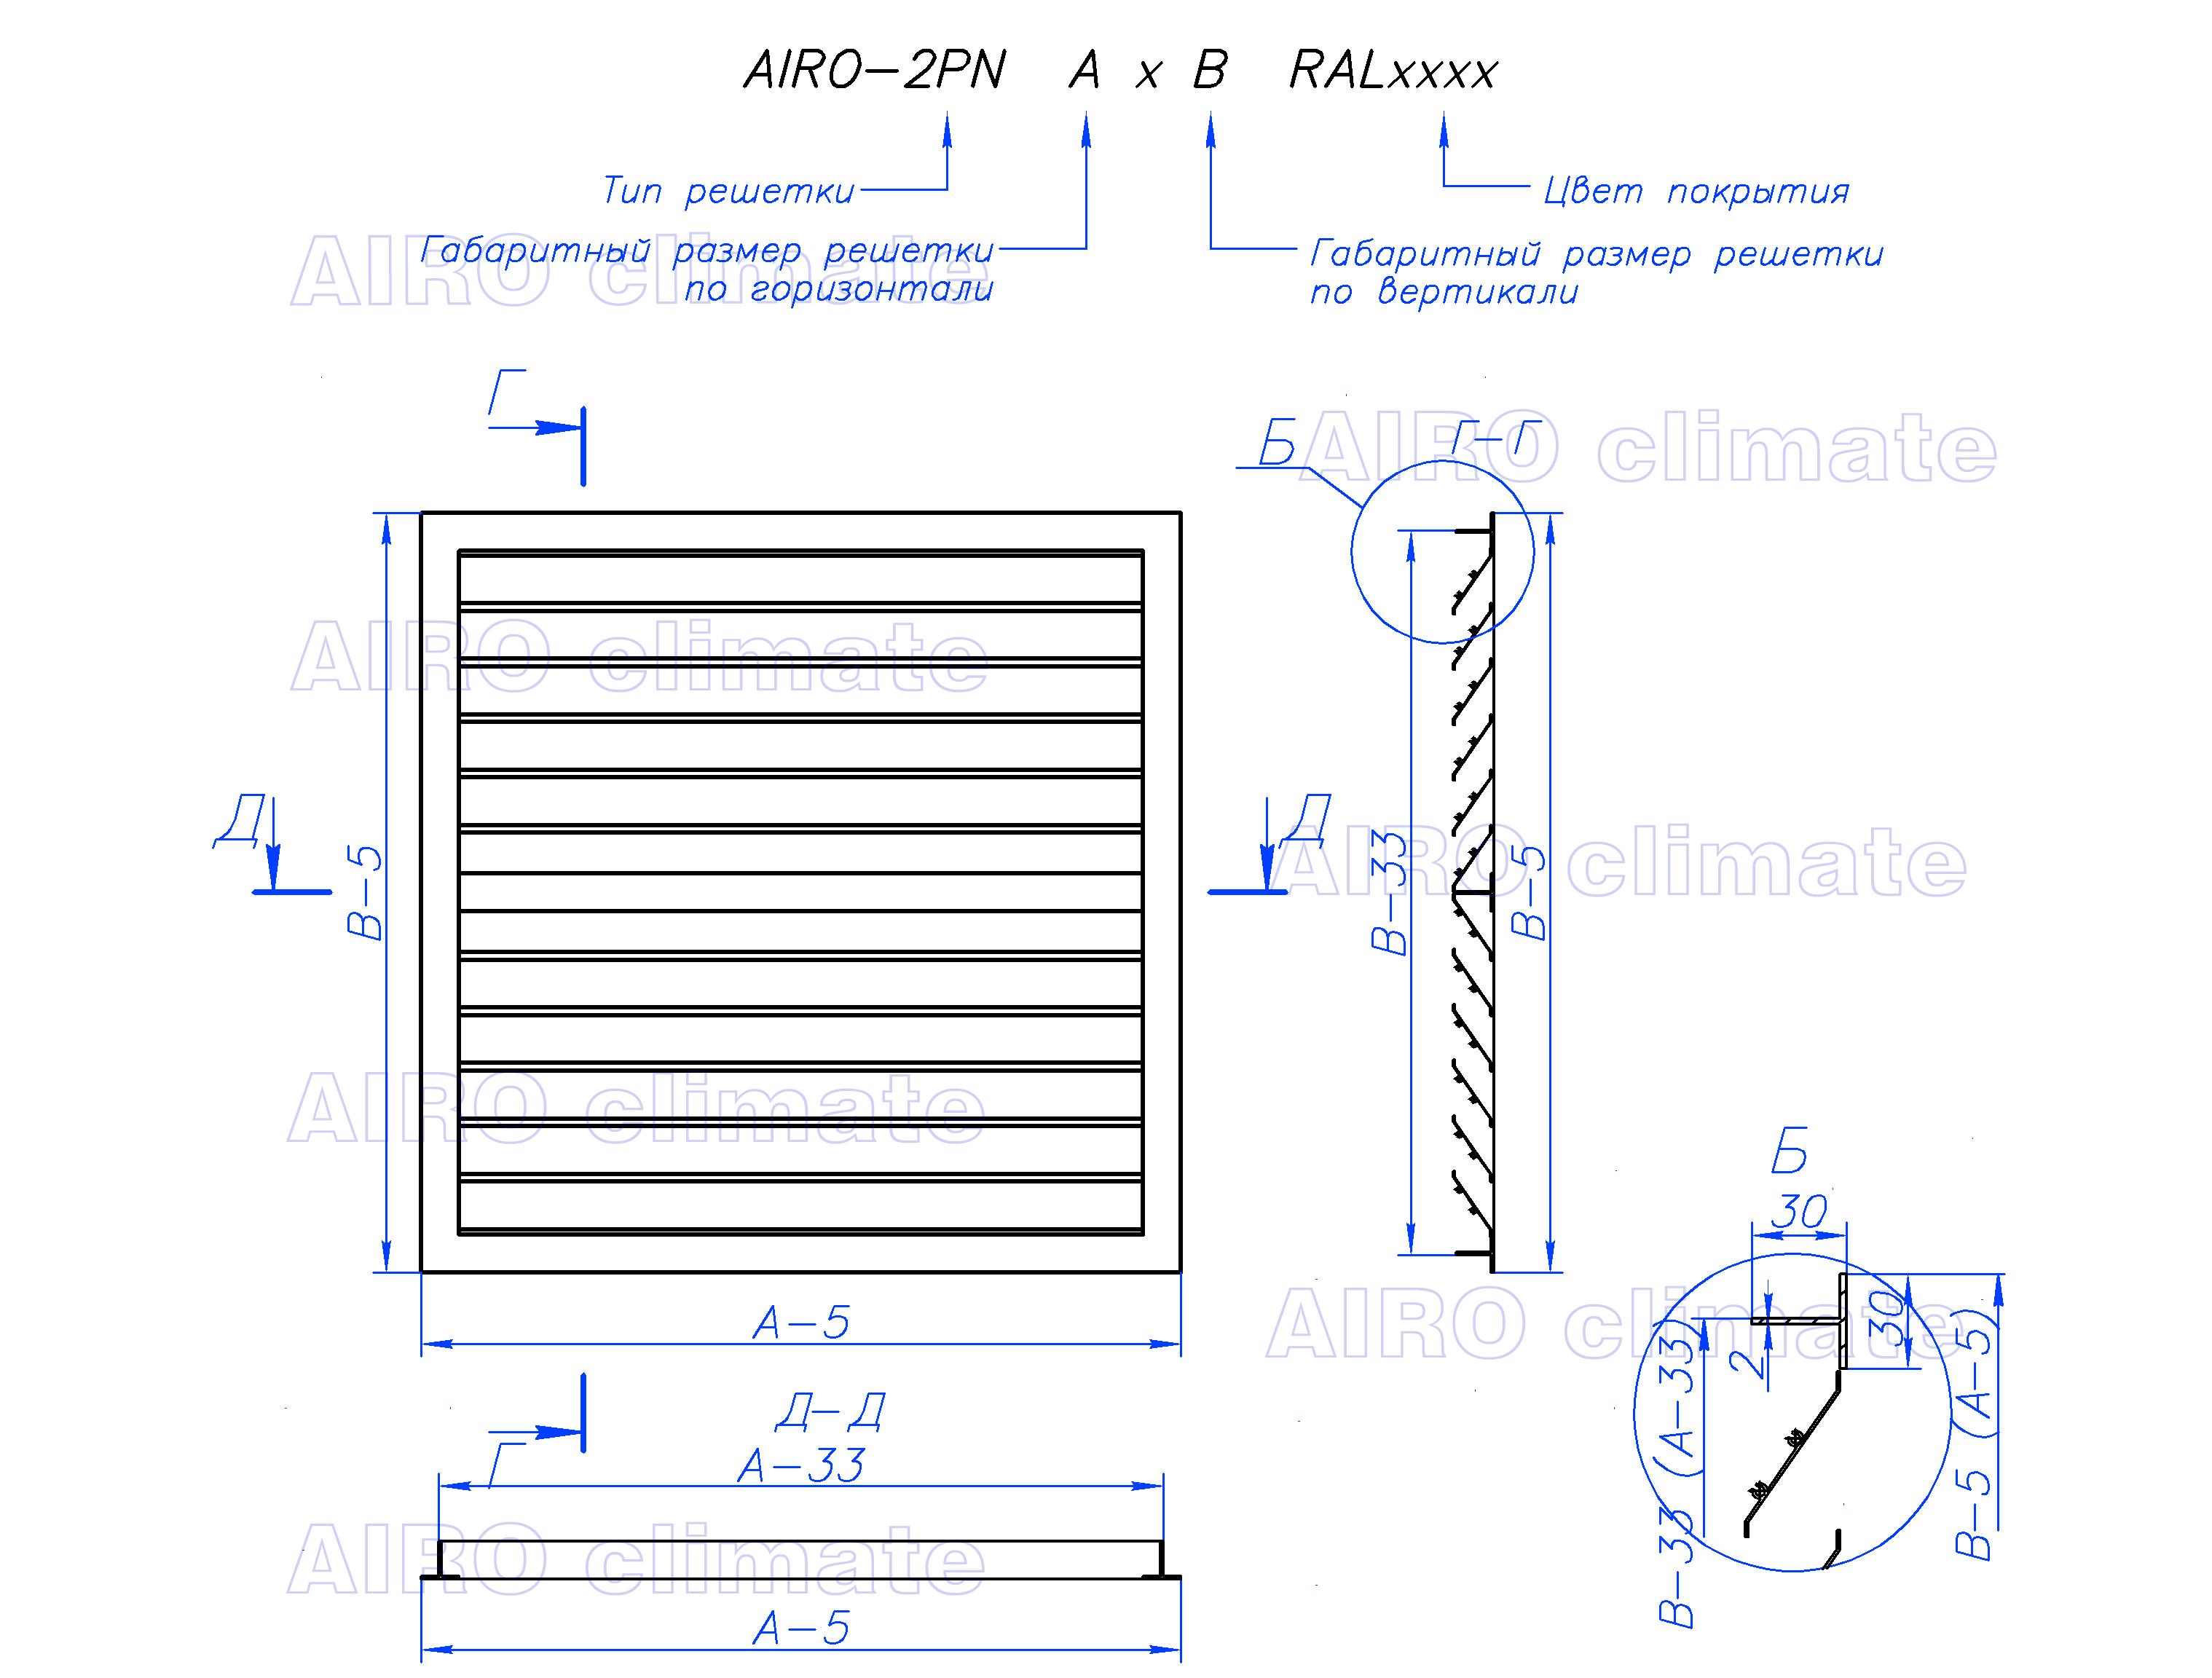 Чертеж решетки потолочной AIRO-2PN